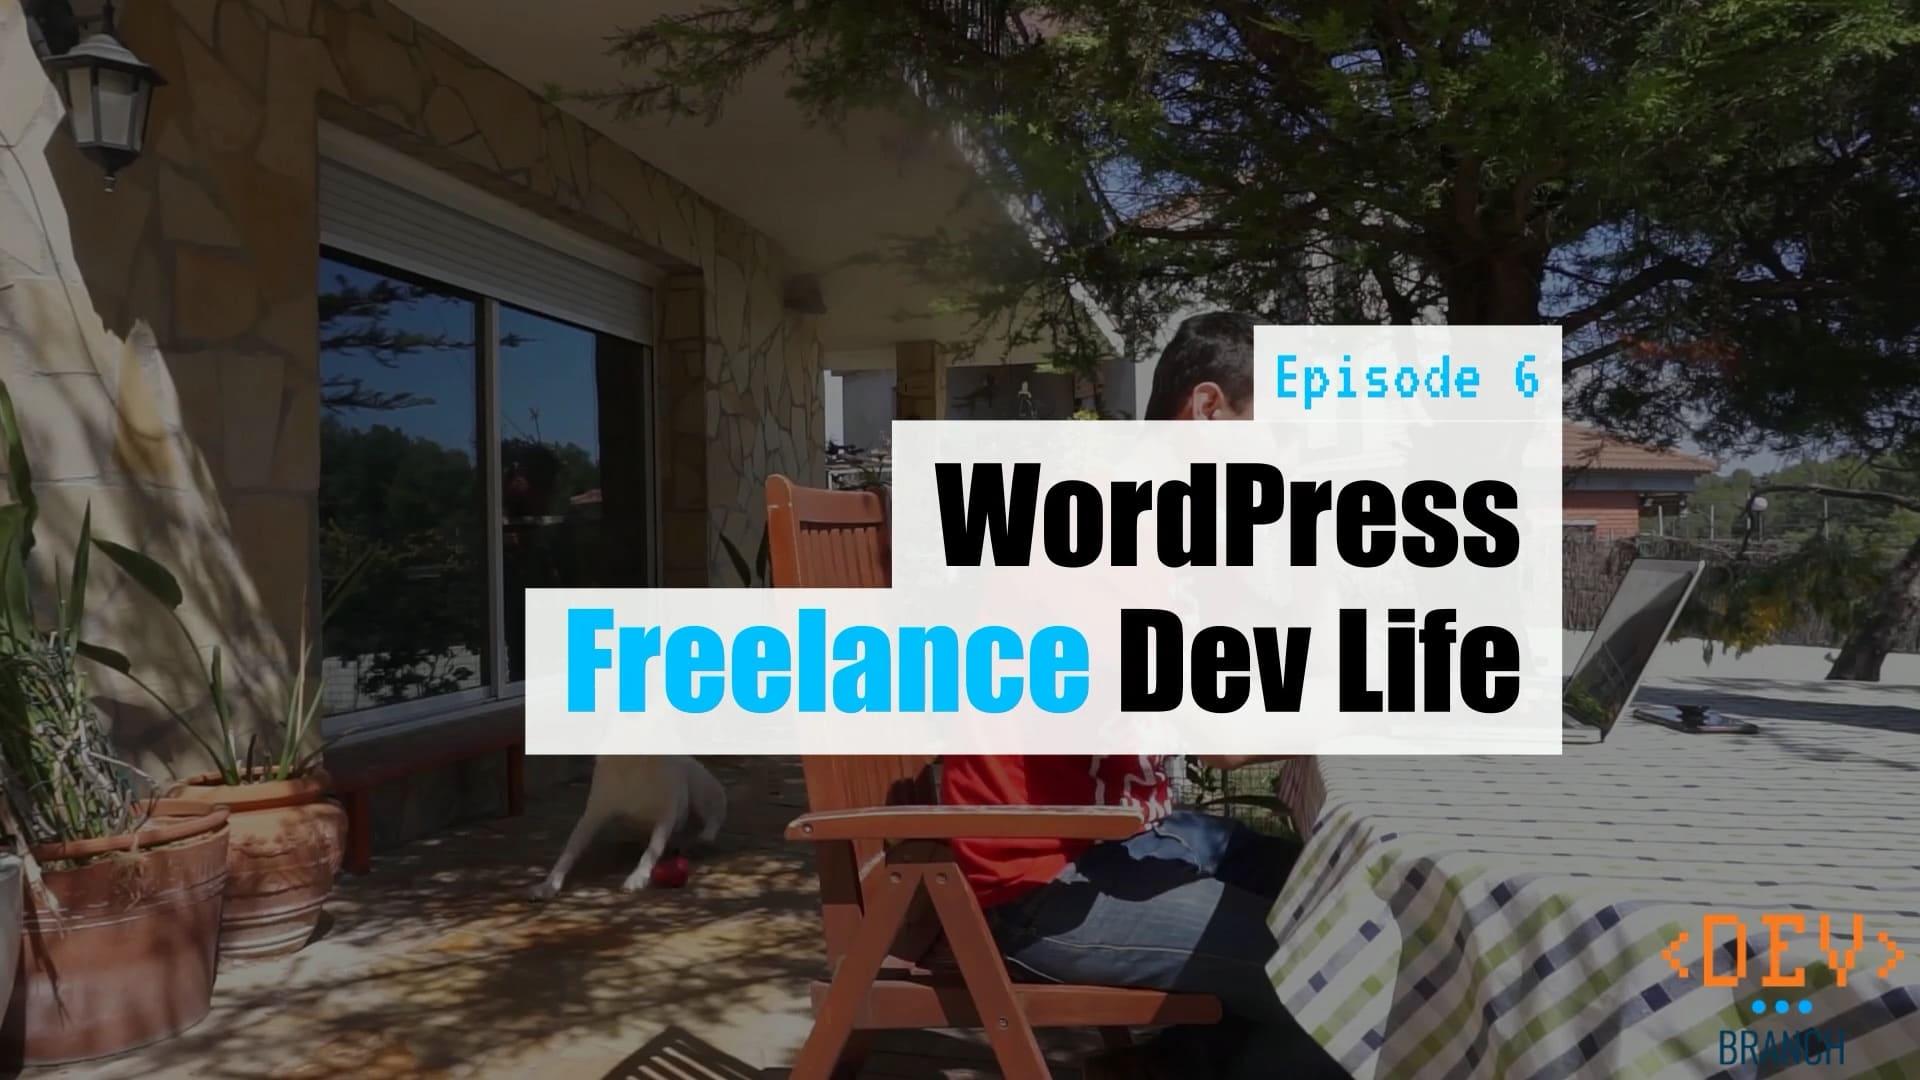 EP6 - WordPress Freelance Dev Life - Dev Branch